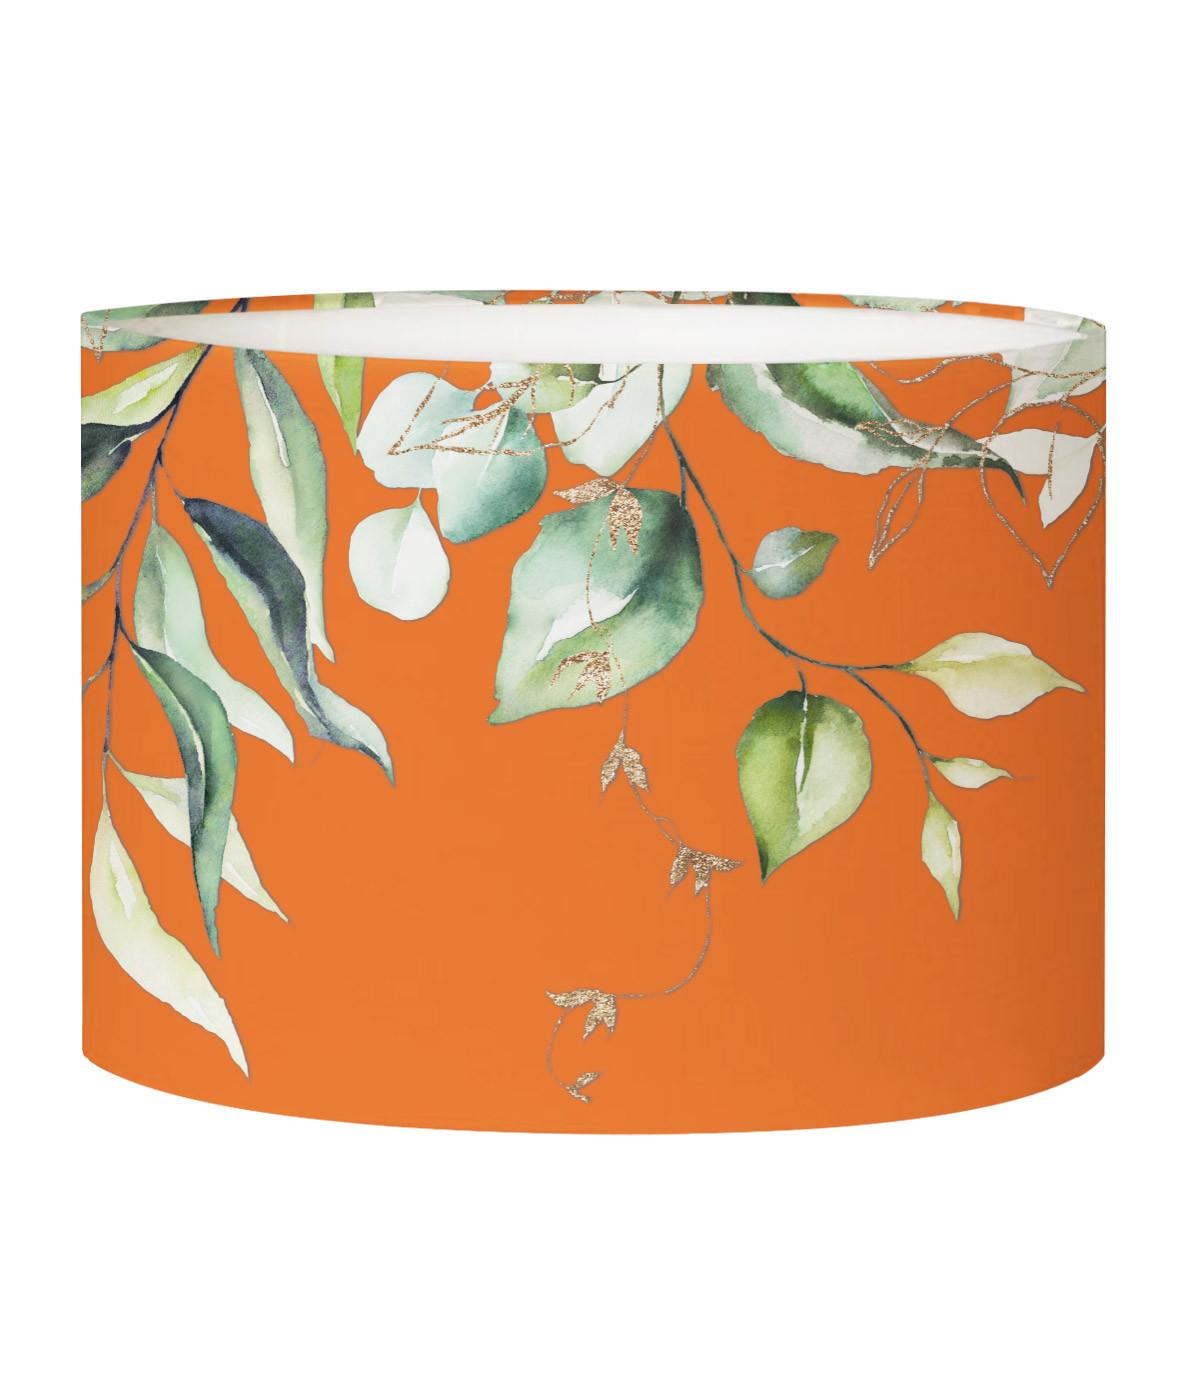 Abat-jour chevet Branche Mandarine D 25 x H 20